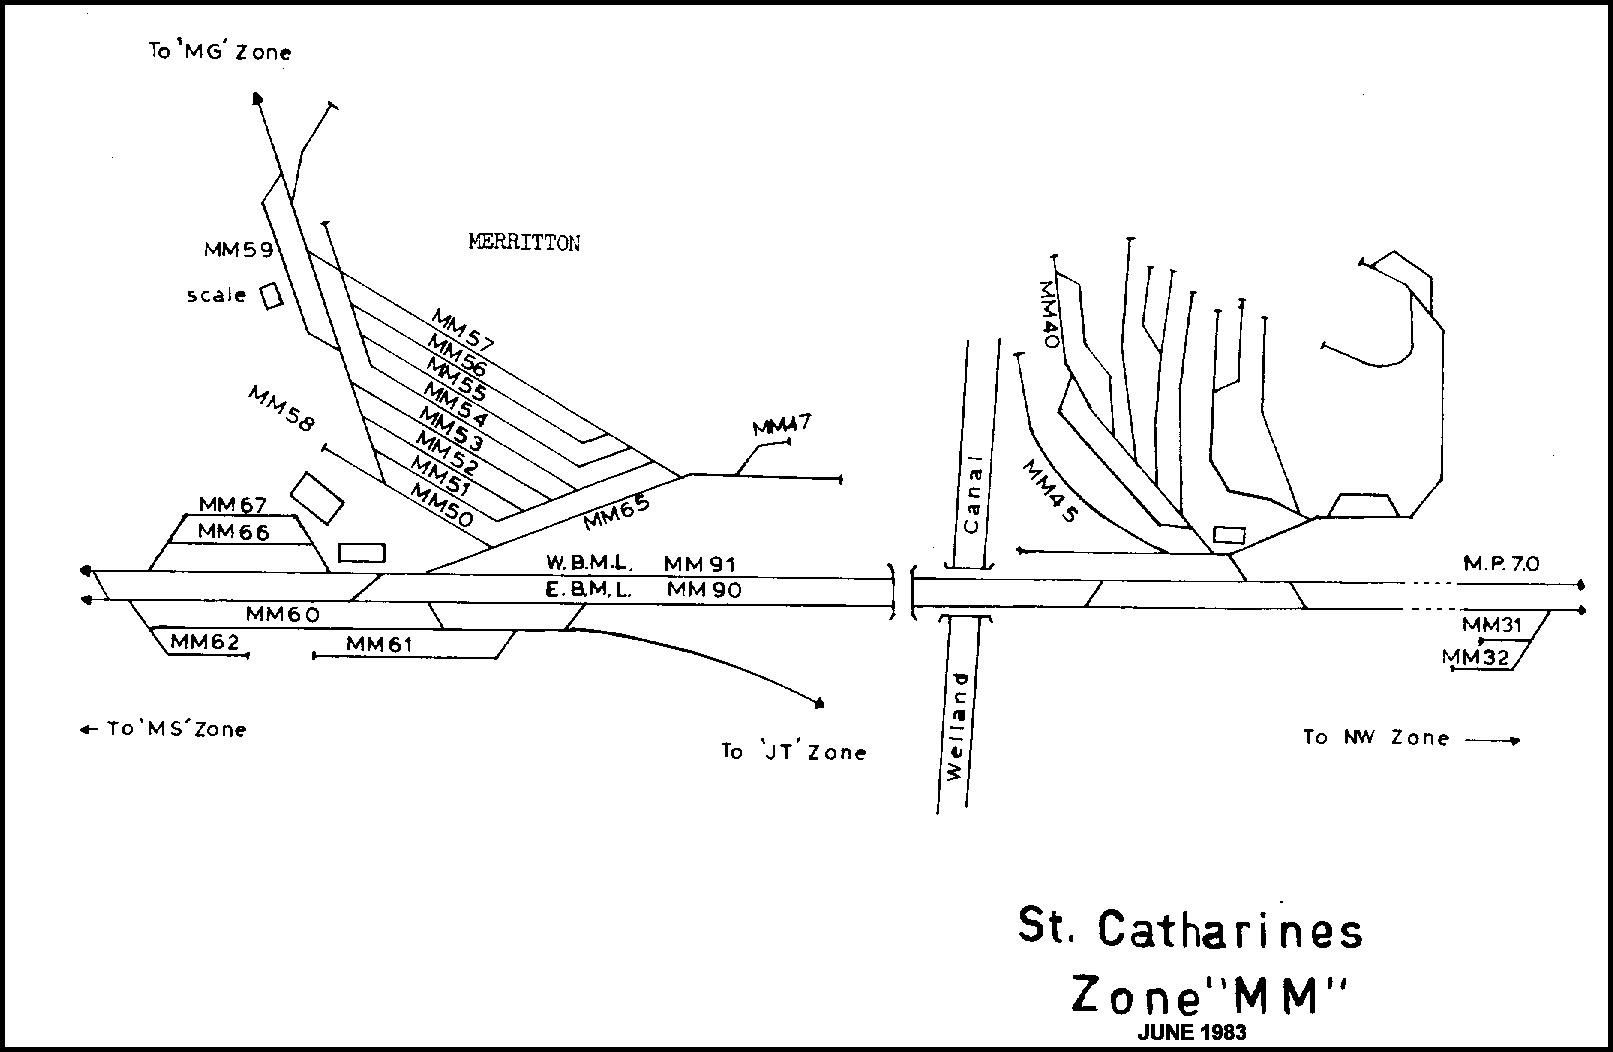 St Catharines Cnr Track Maps S Niagara Electrics